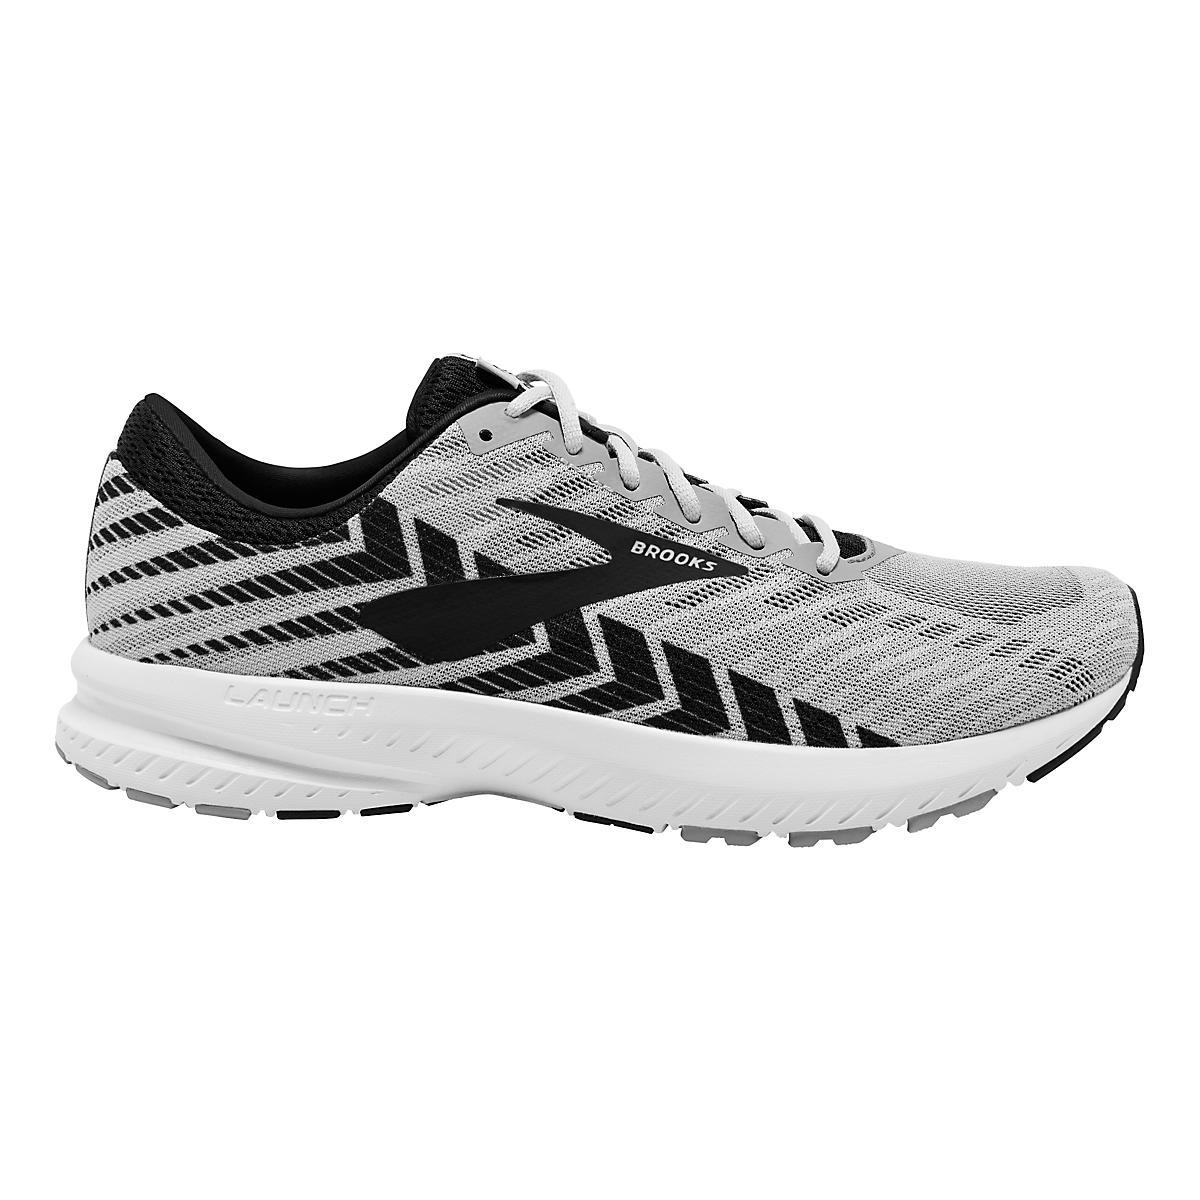 ecf7bb5936b10 Mens Brooks Launch 6 Running Shoe at Road Runner Sports